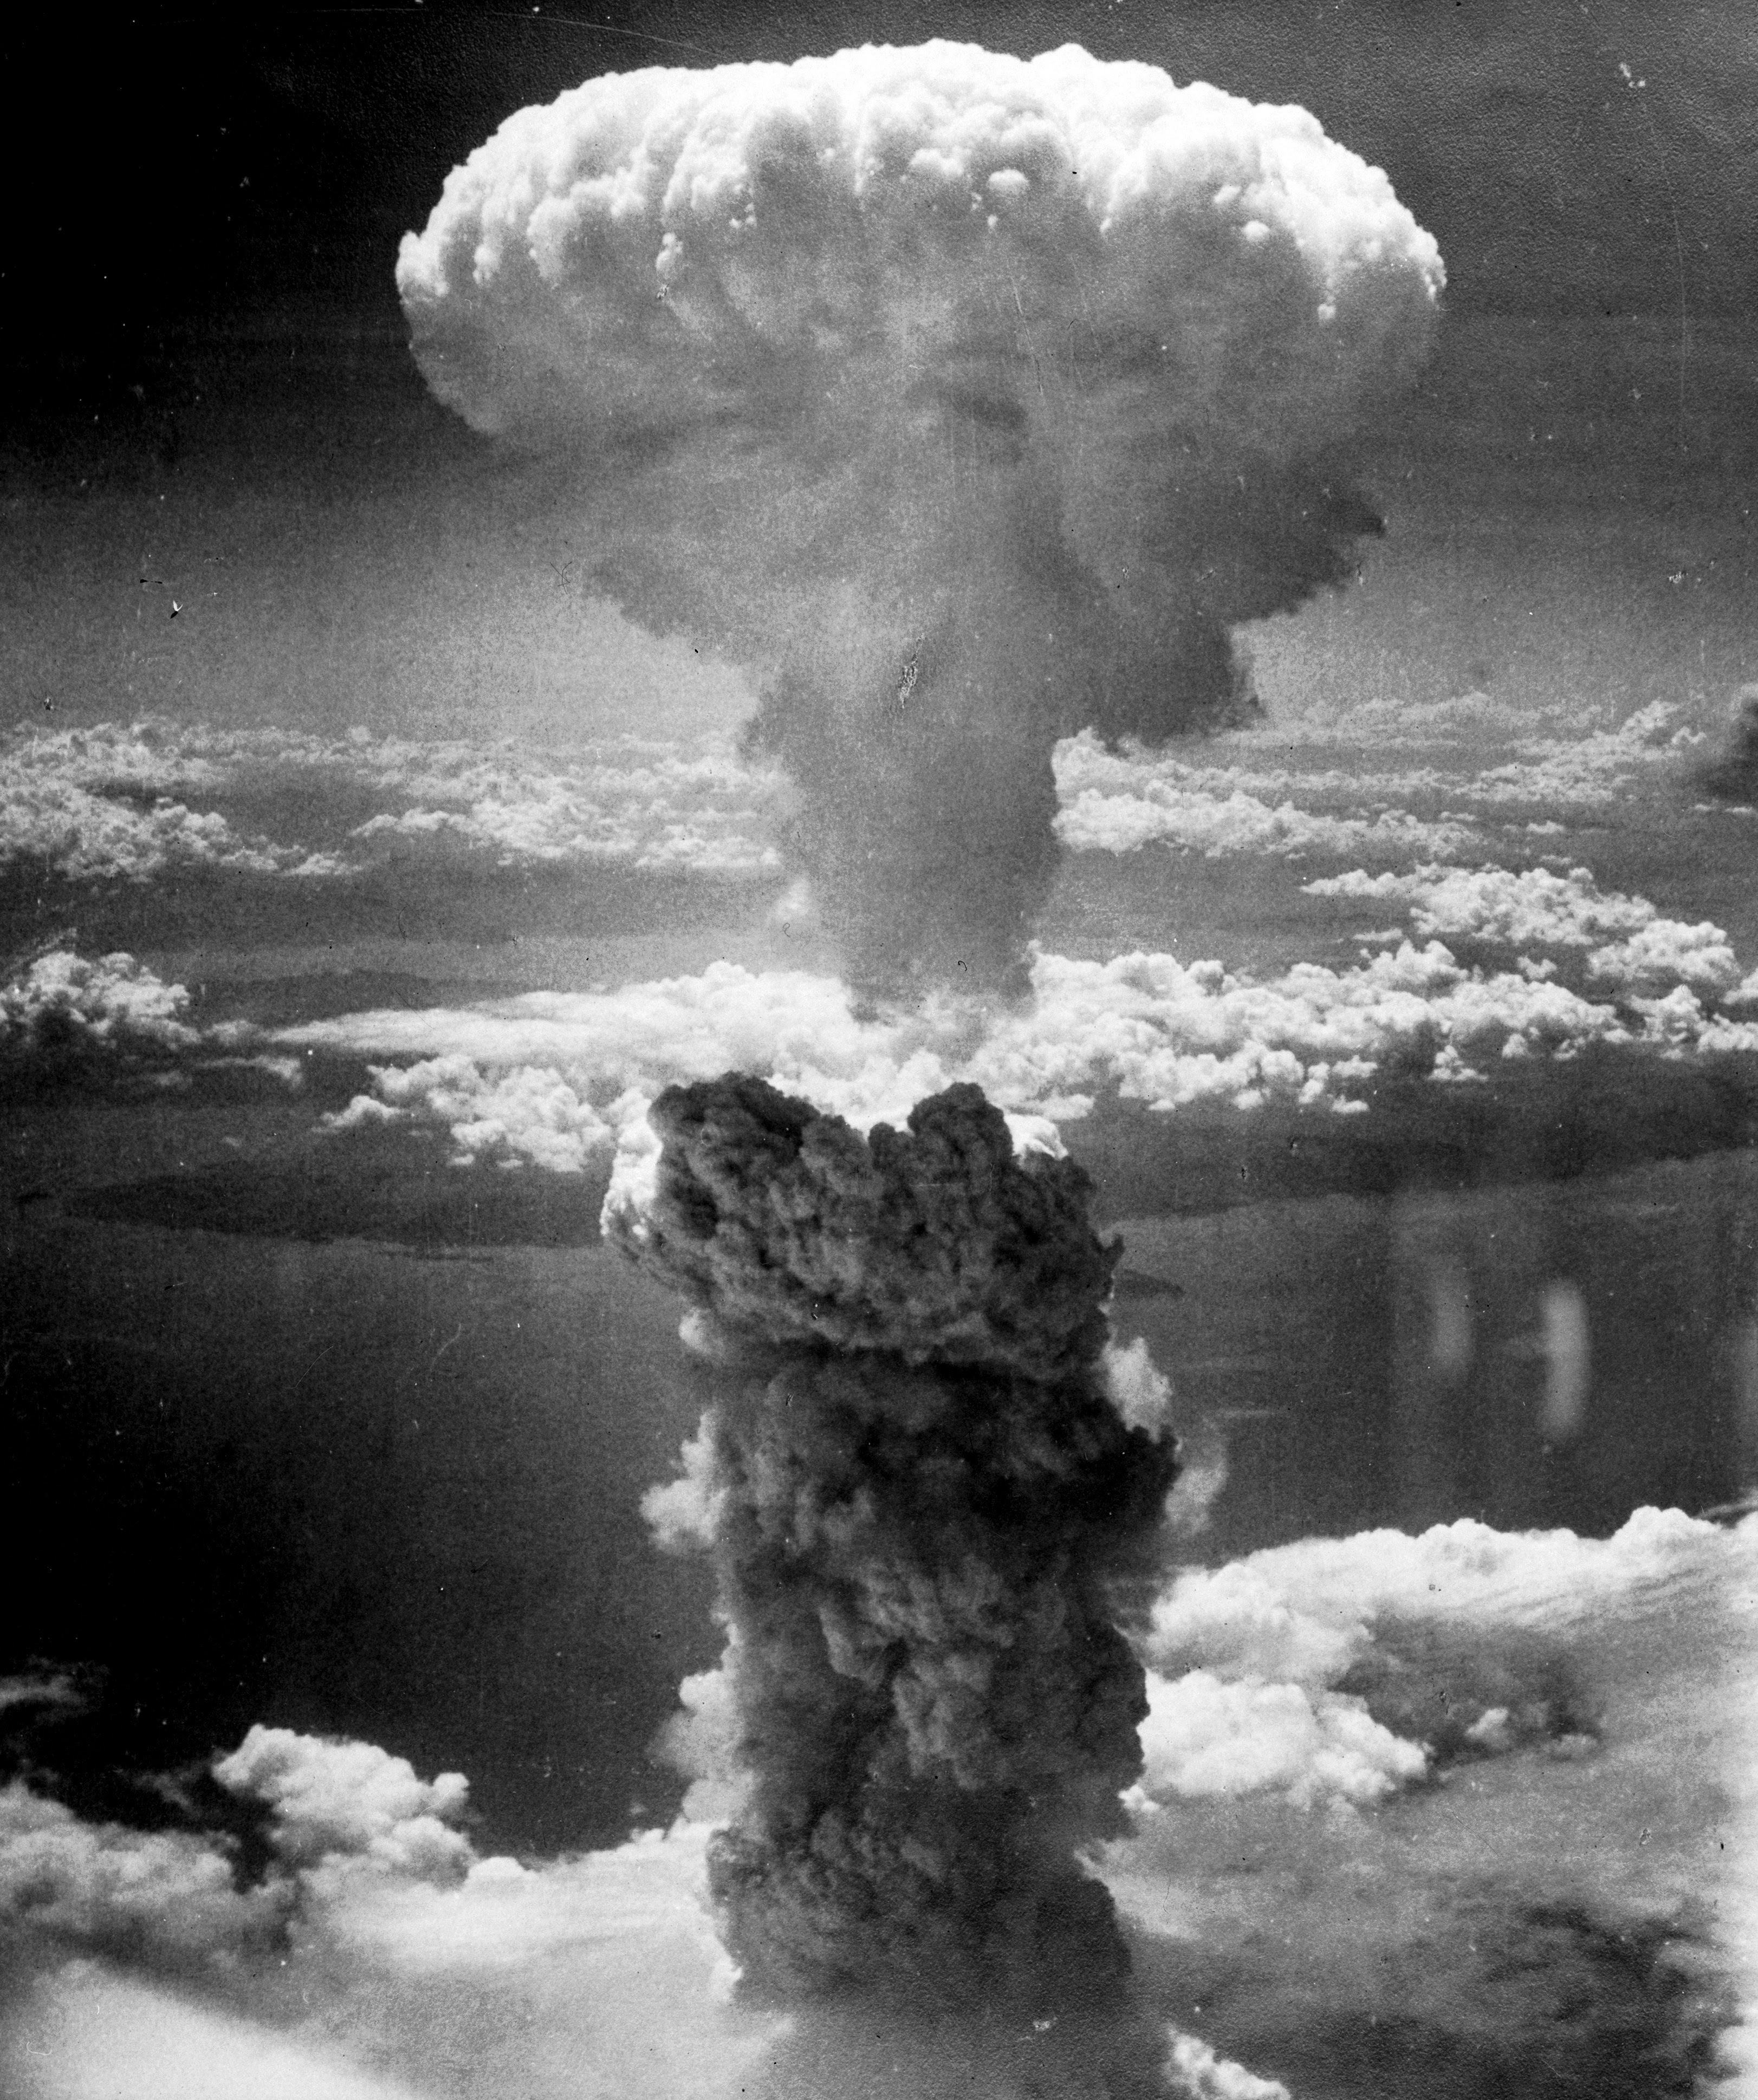 Remember Nagasaki!